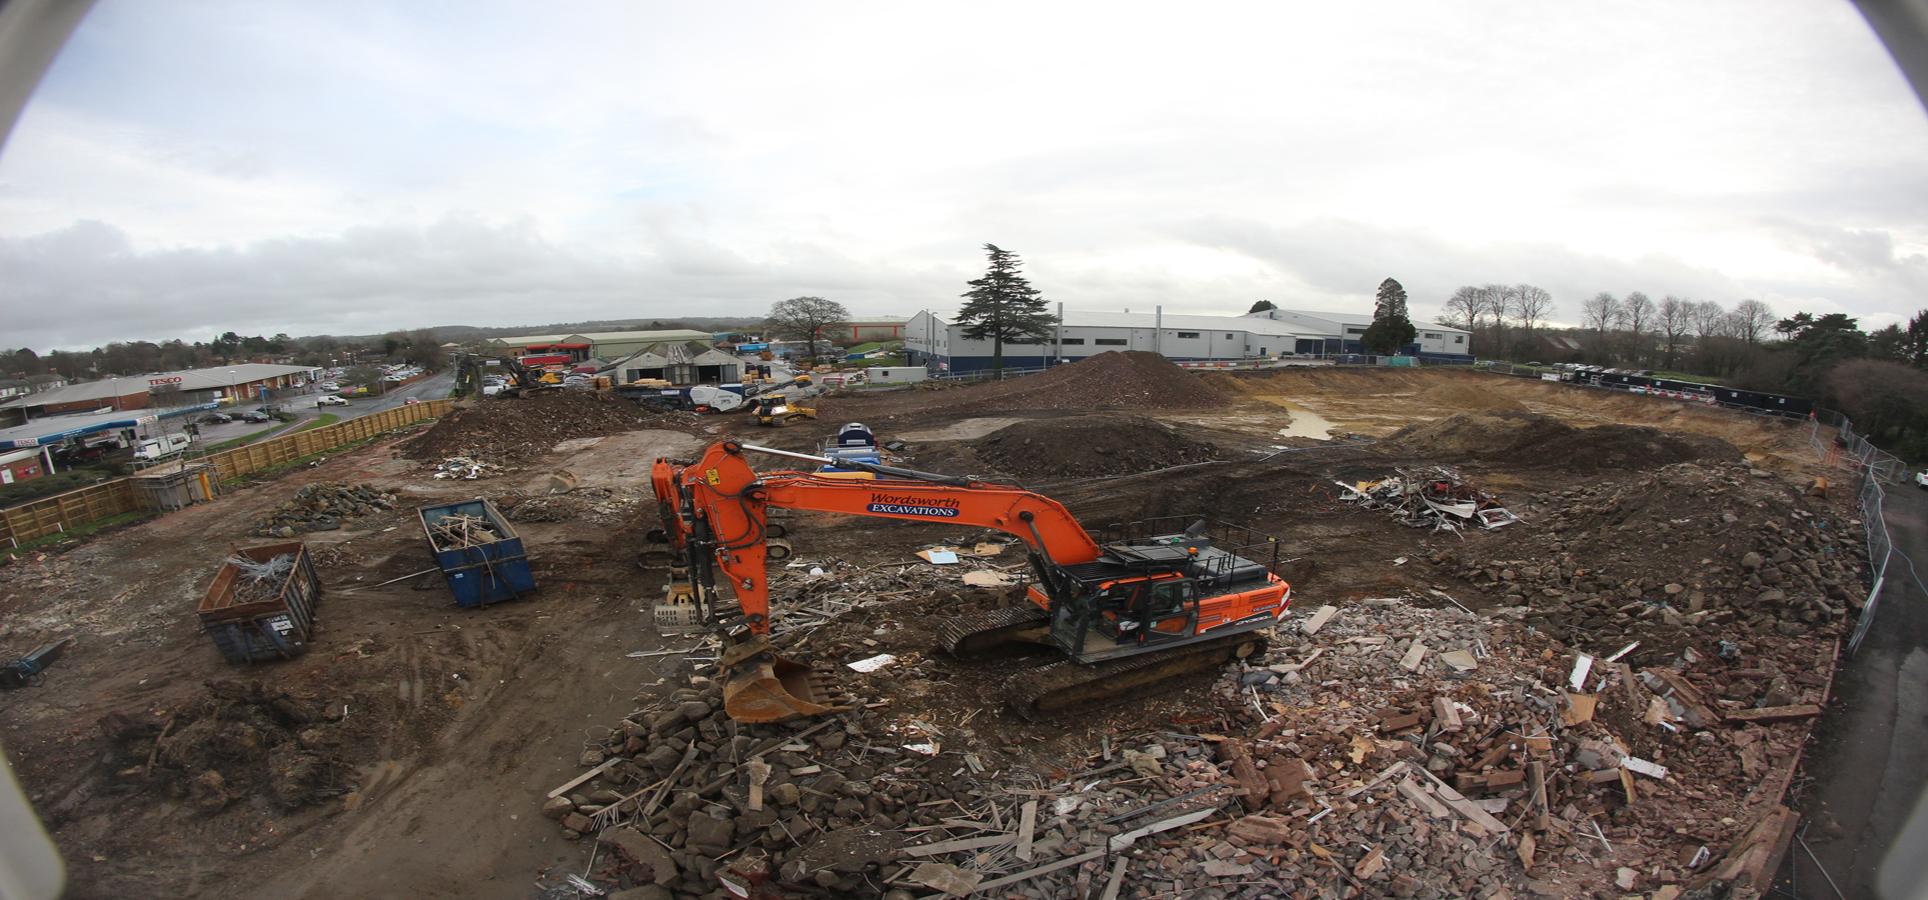 Works commence at Chard, Jessops Construction Ltd